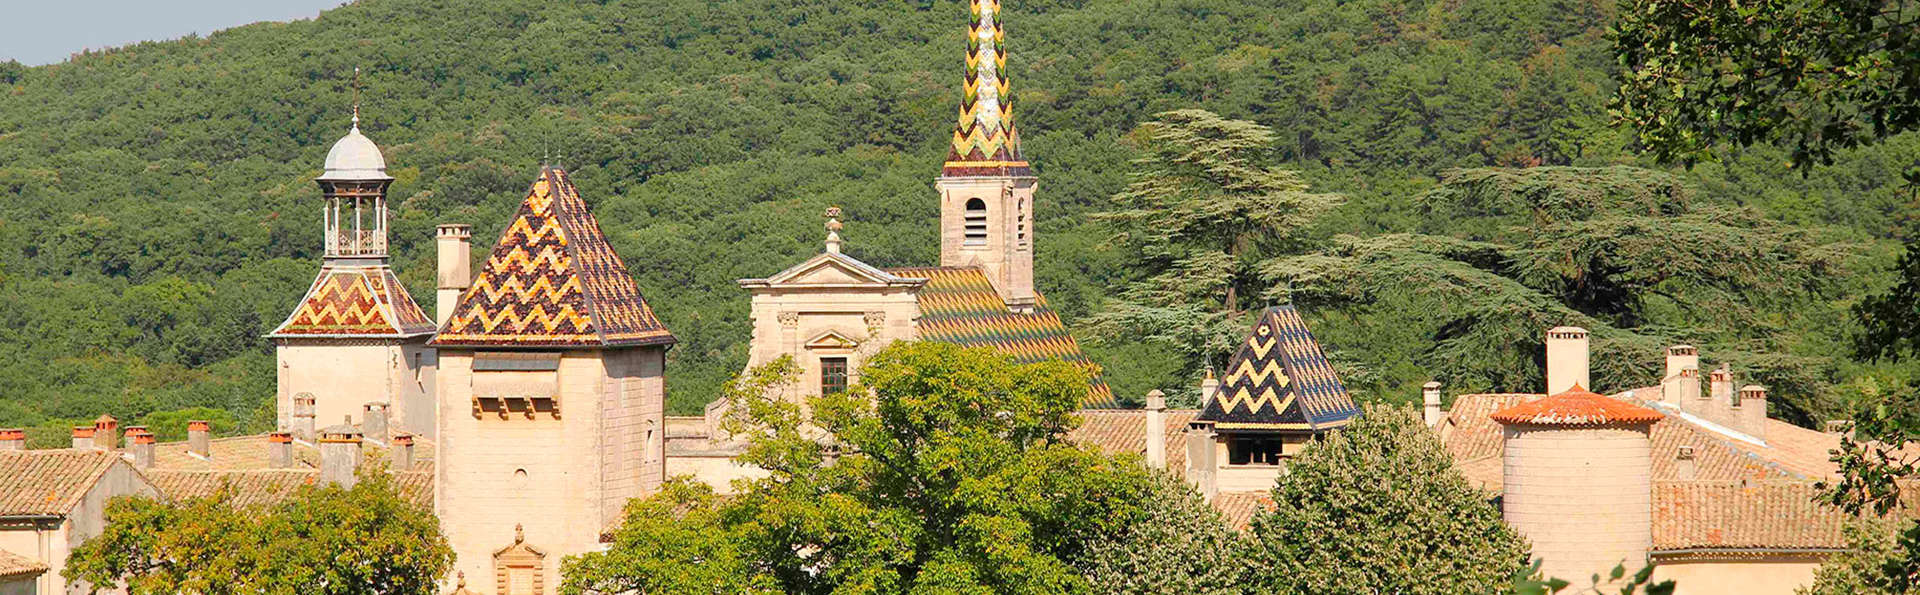 Castel Provence - edit_land.jpg